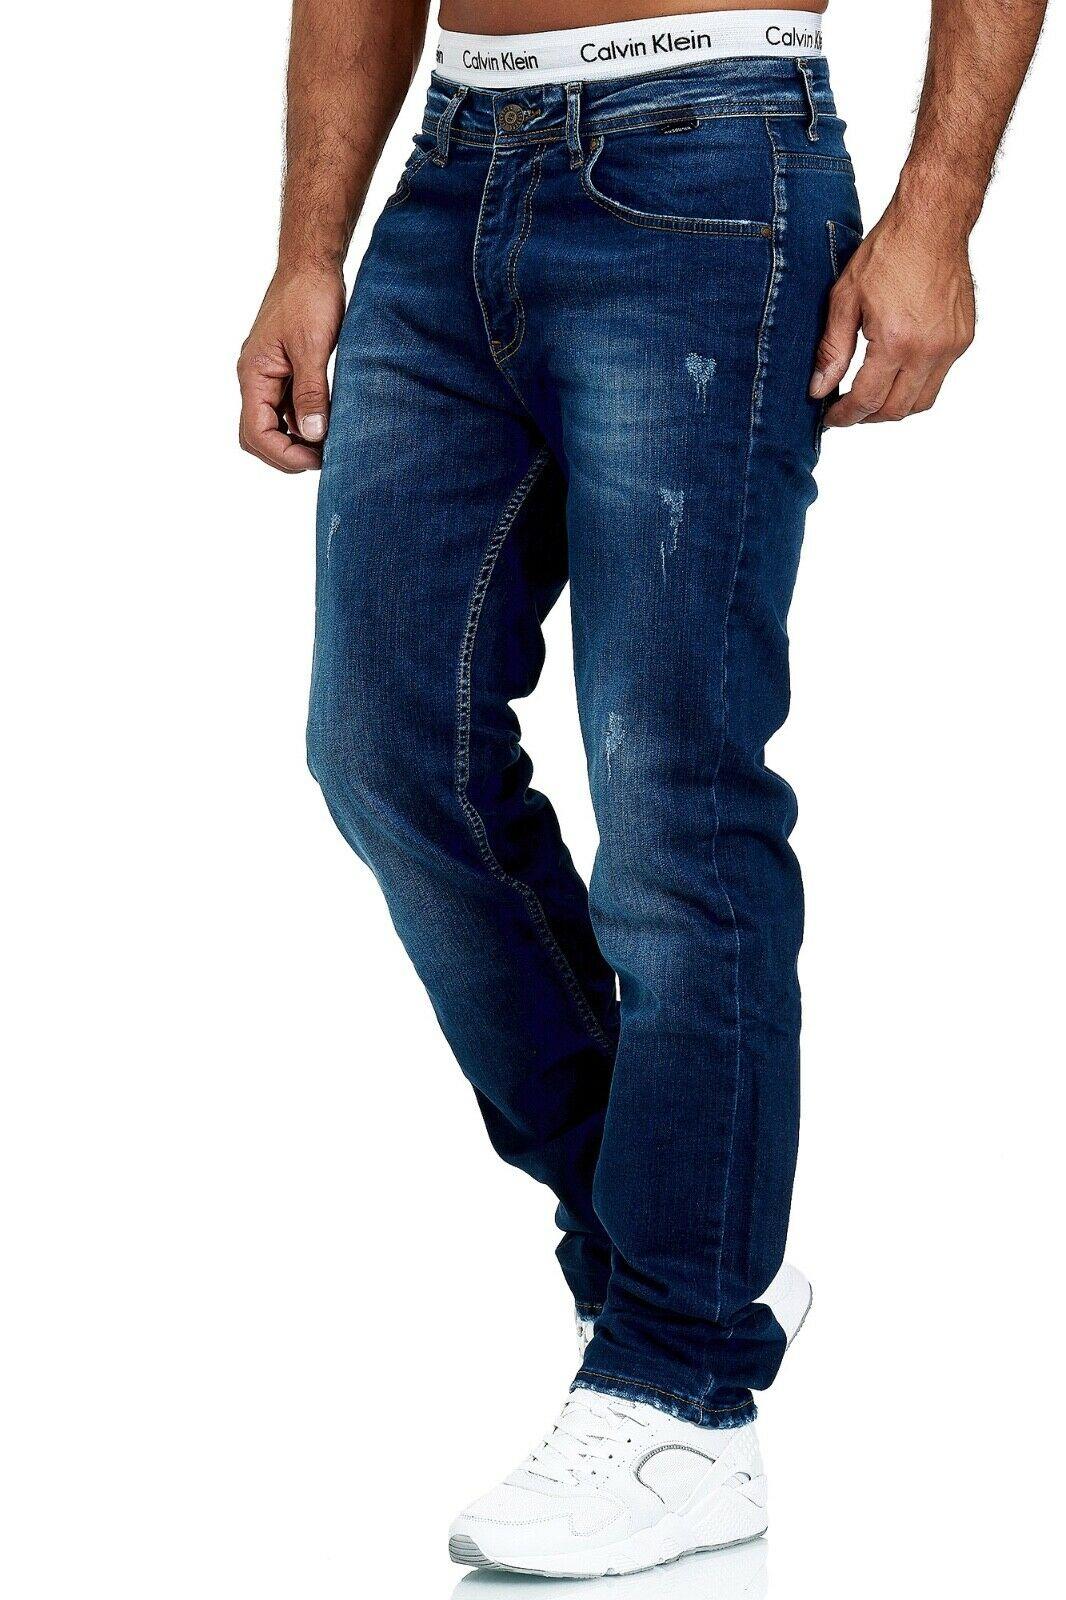 Herren-Jeans-Hose-Denim-KC-Black-Washed-Straight-Cut-Regular-Dicke-Naht-naehte Indexbild 57